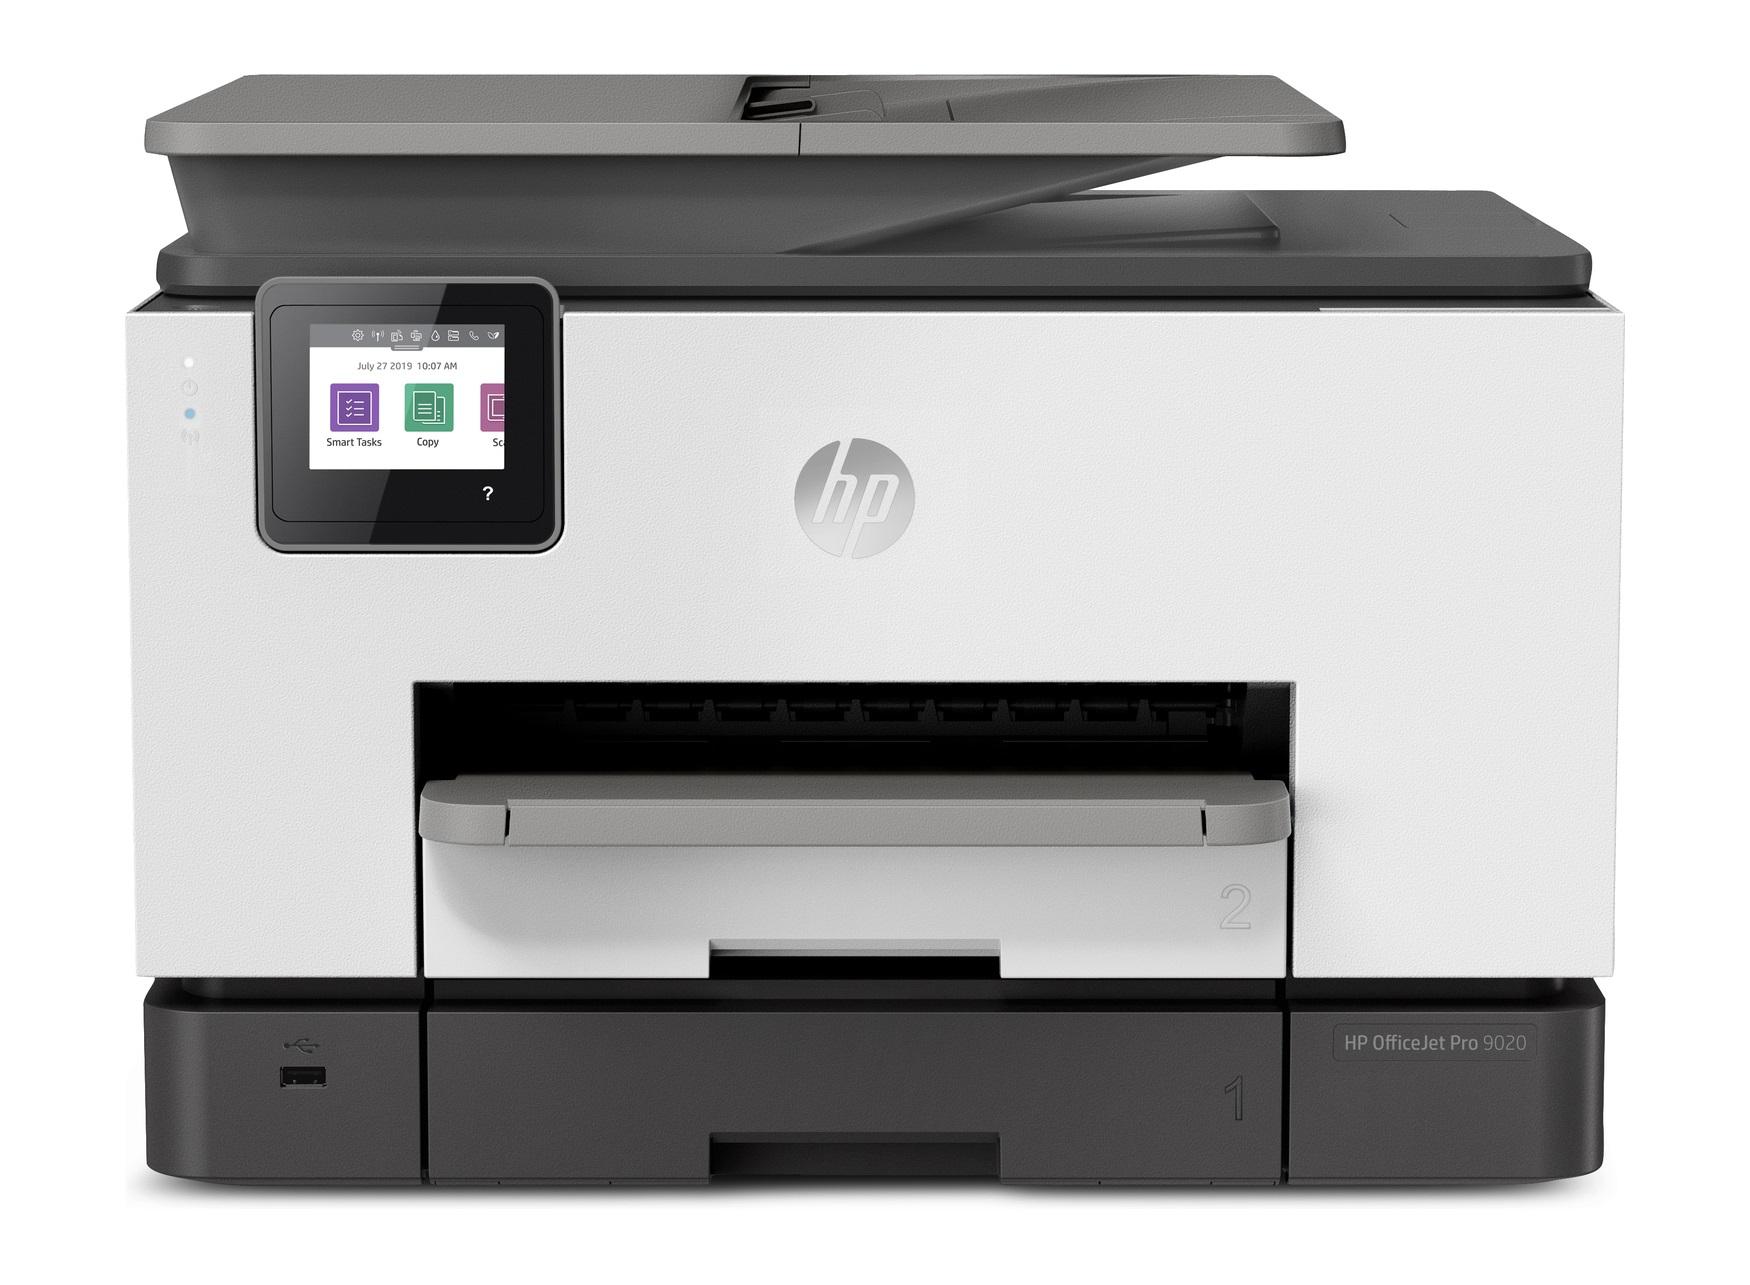 Inkjet Printers OfficeJet Pro 9020 Inkjet Printer